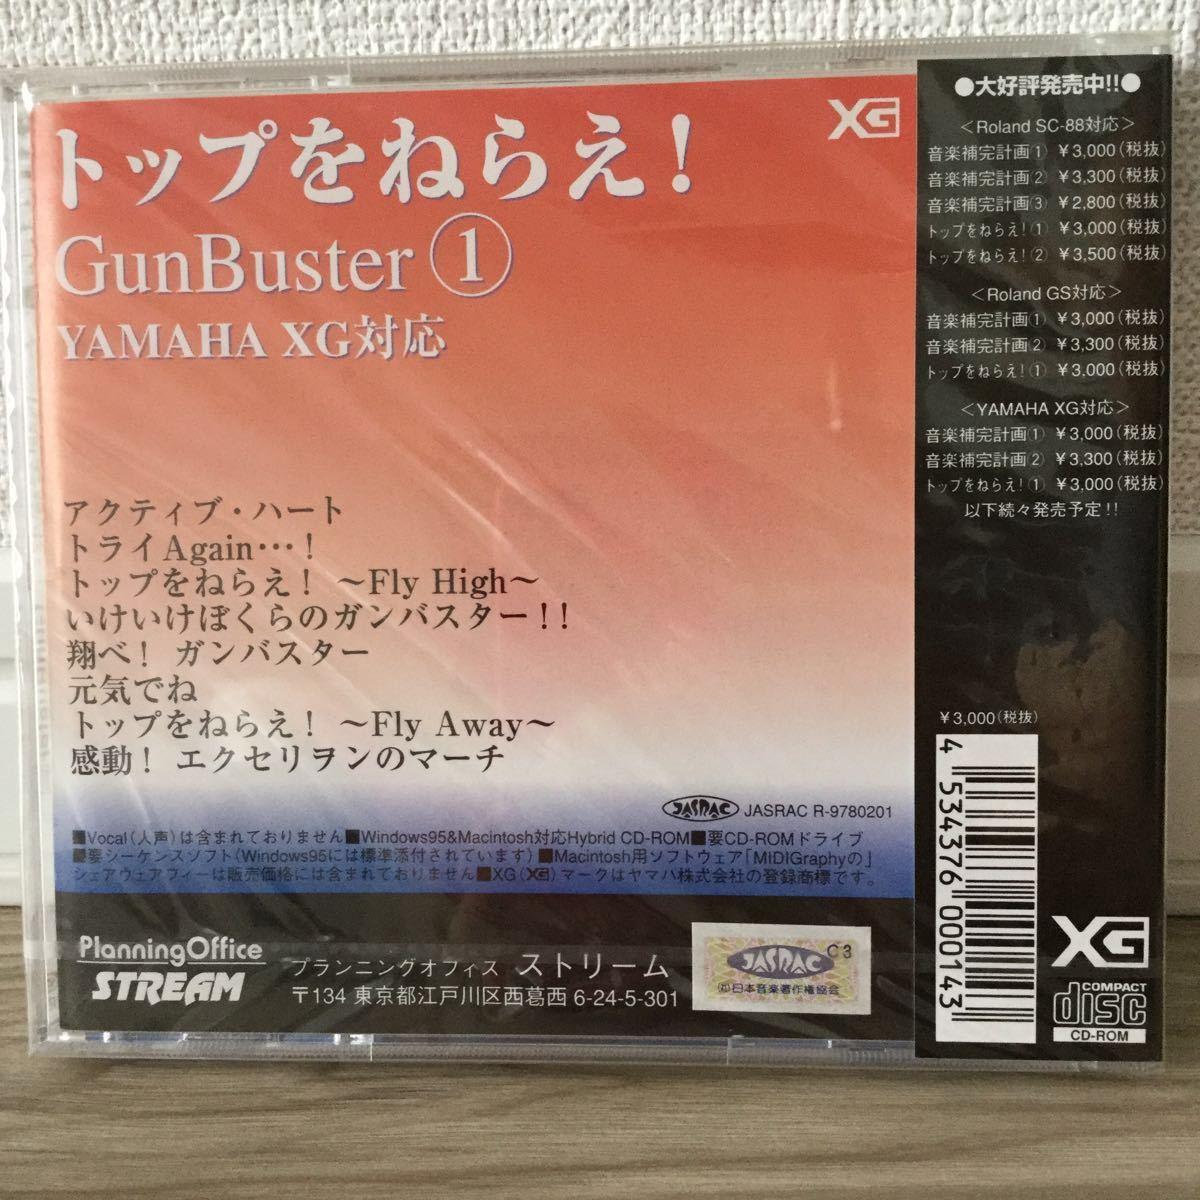 STREAM「トップをねらえ!GunBuster①~②」 SMF (Standard Midi Files) データ_画像3